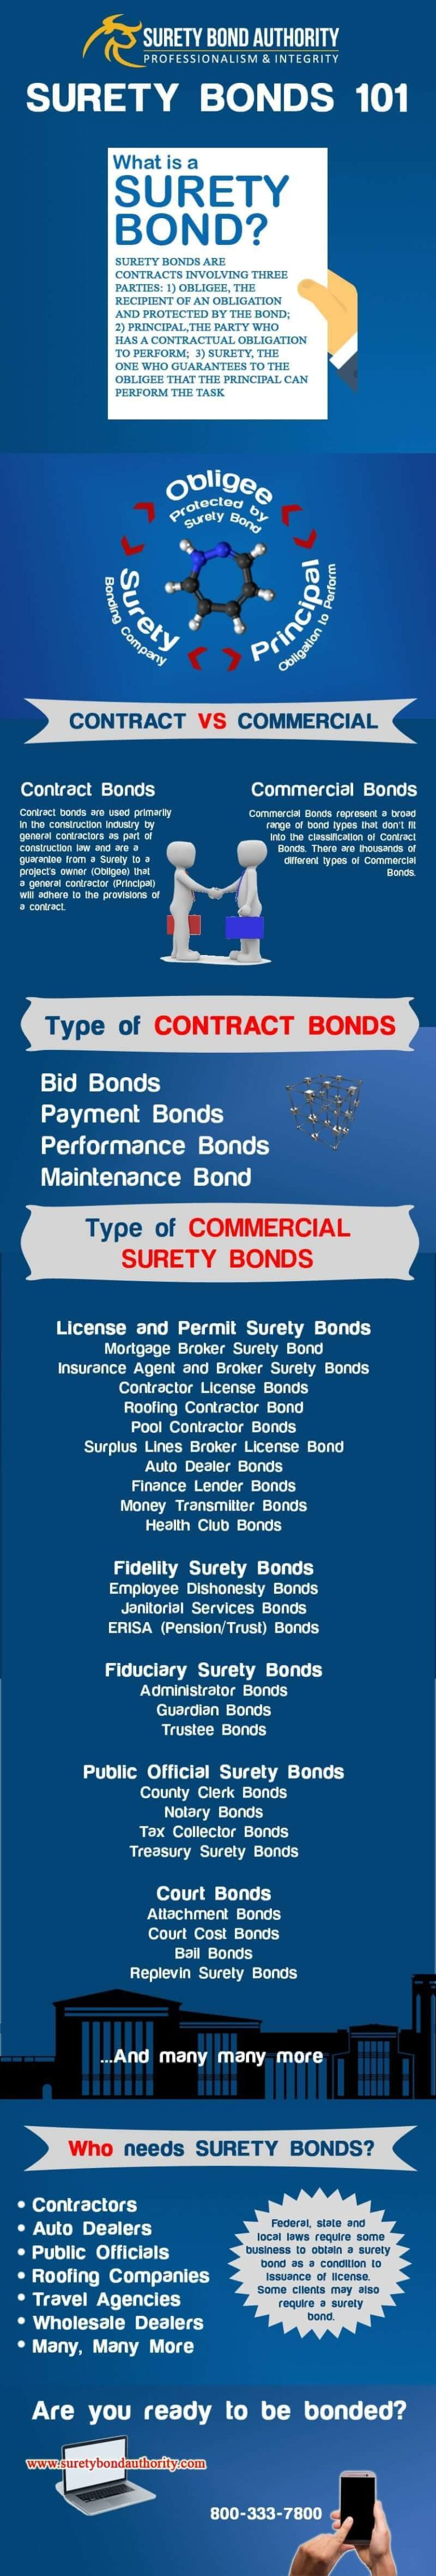 Surety Bond 101 infographic